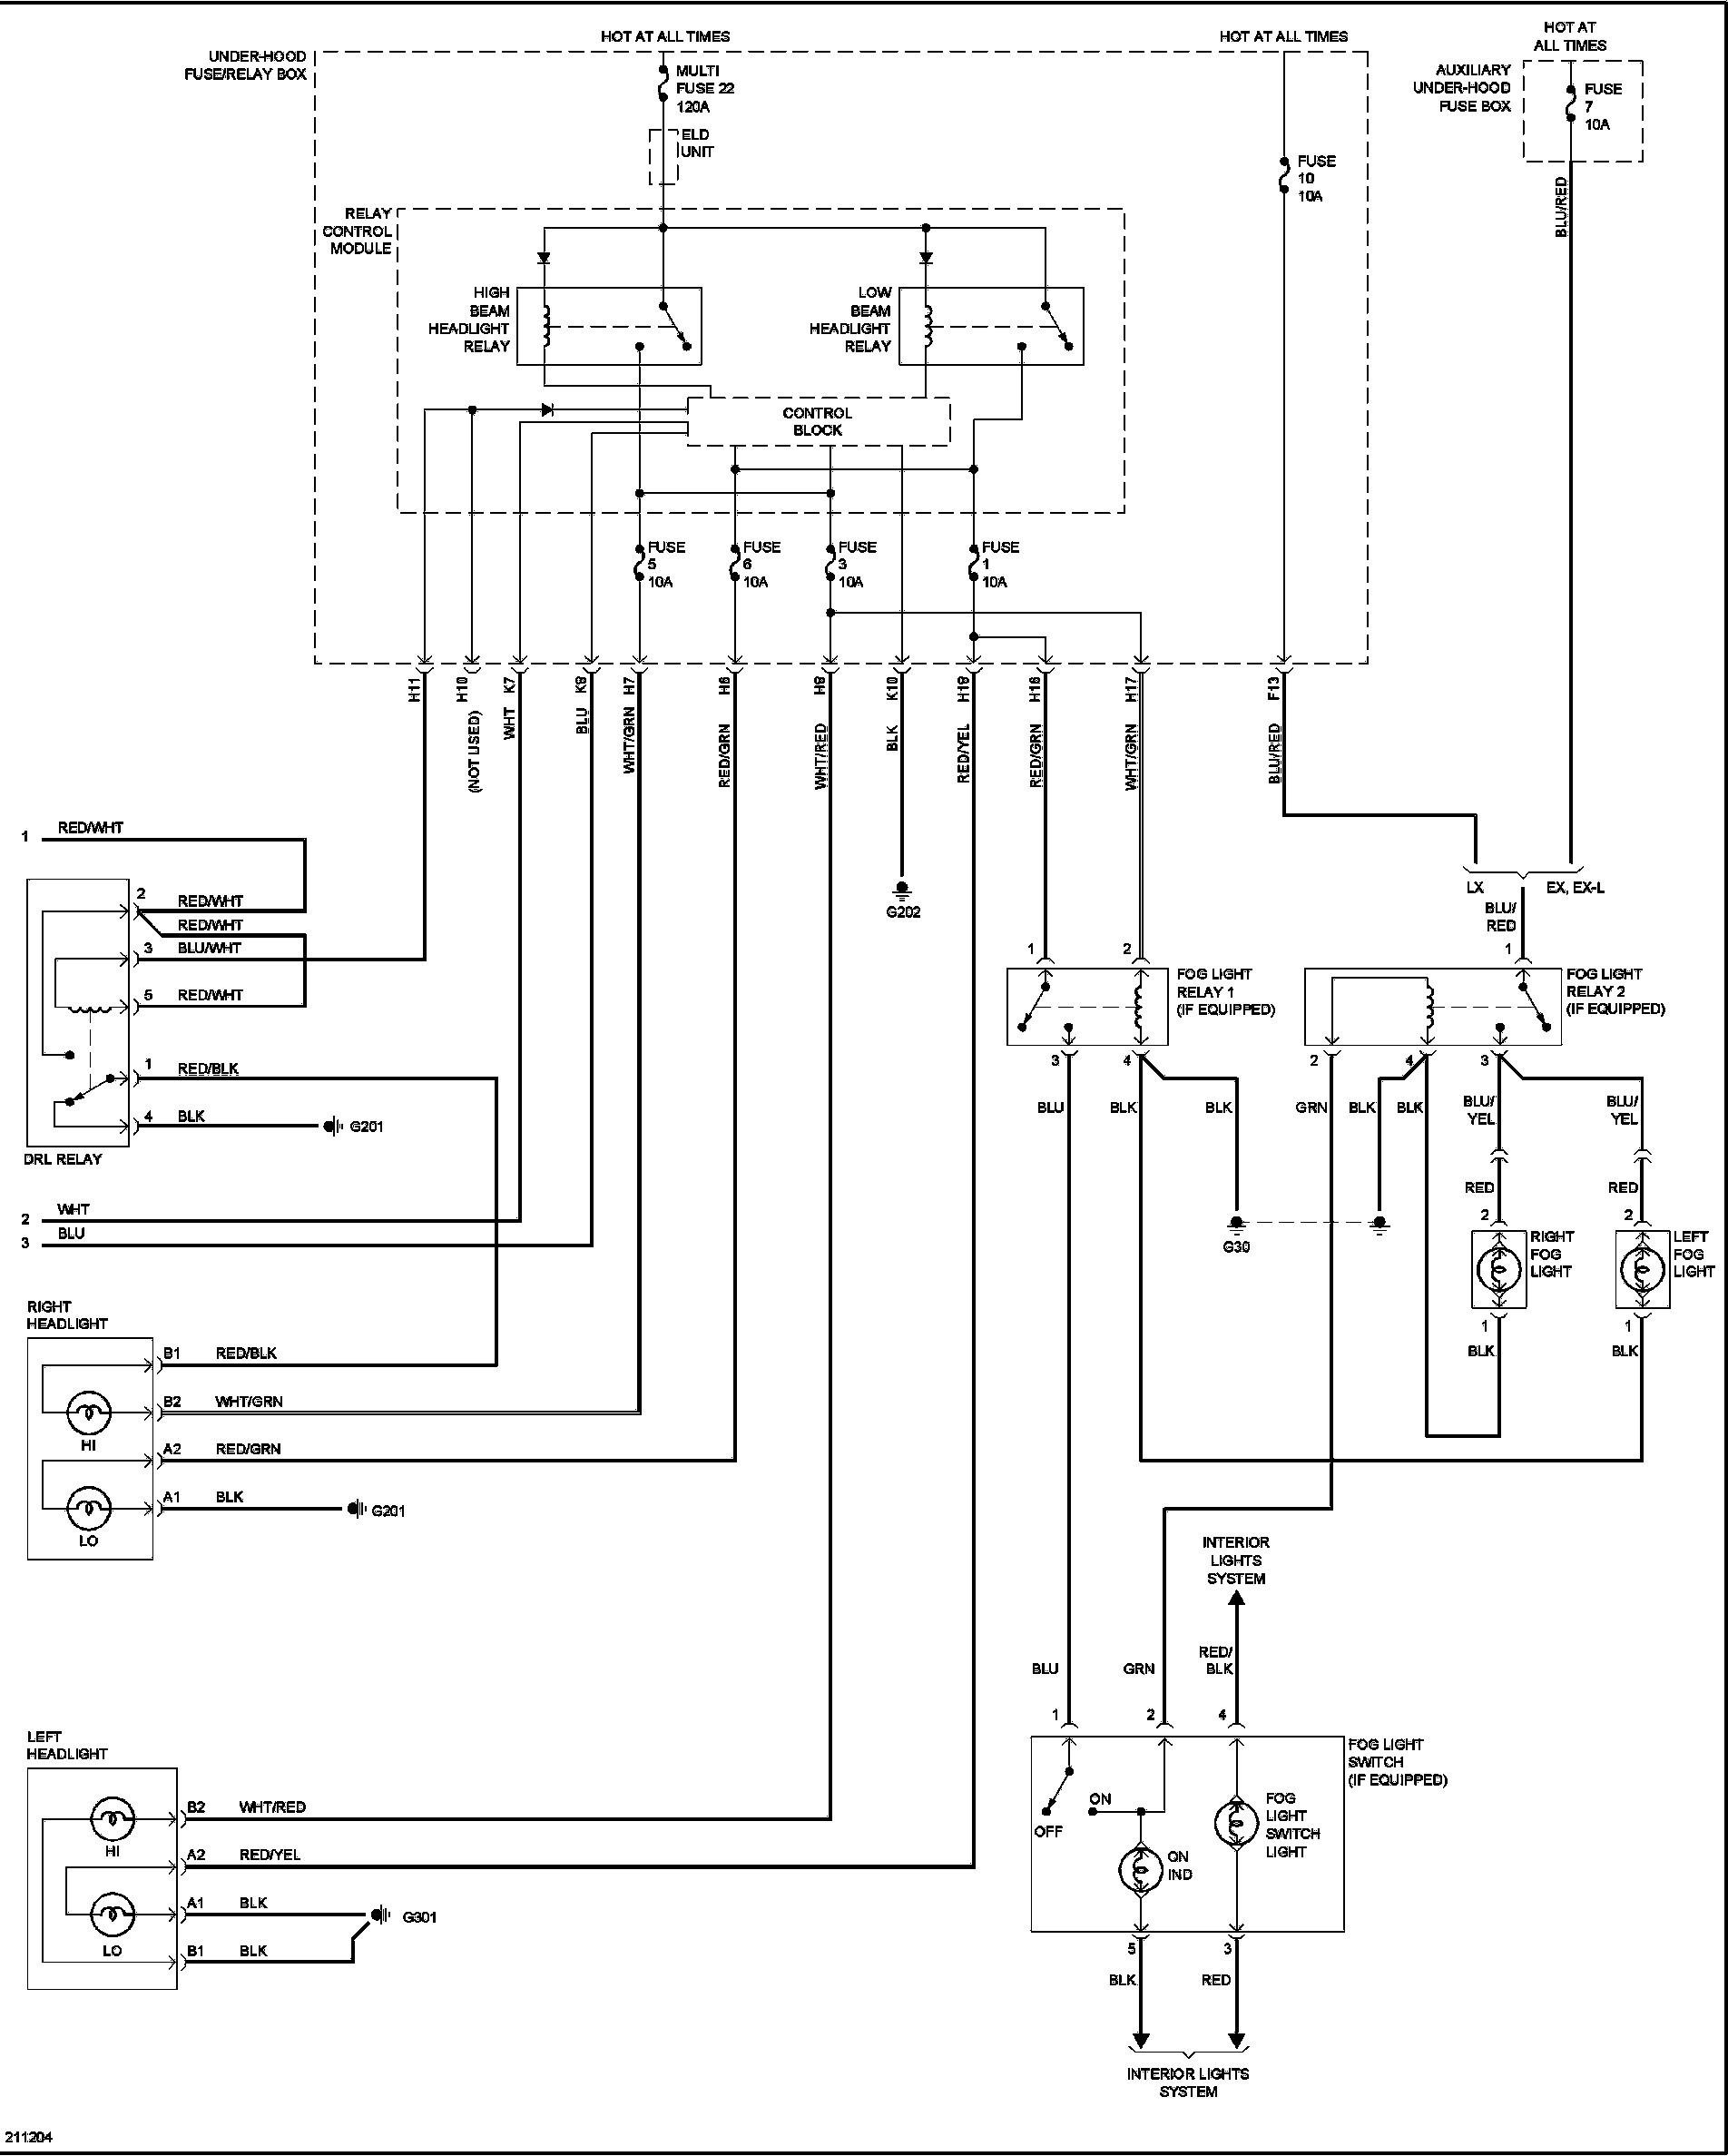 2007 Honda Accord Wiring Diagram | Wiring DiagramWiring Diagram - AutoScout24